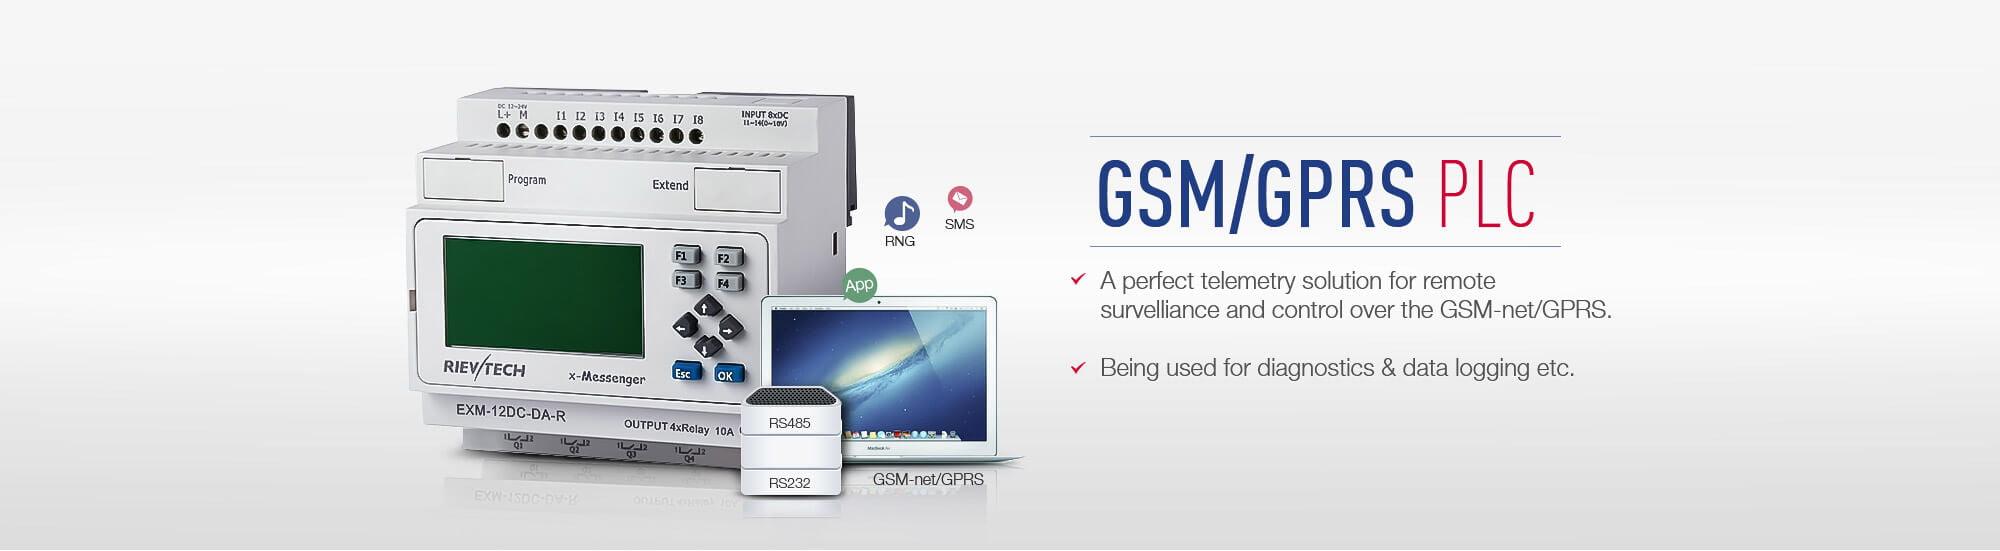 gsm-plc